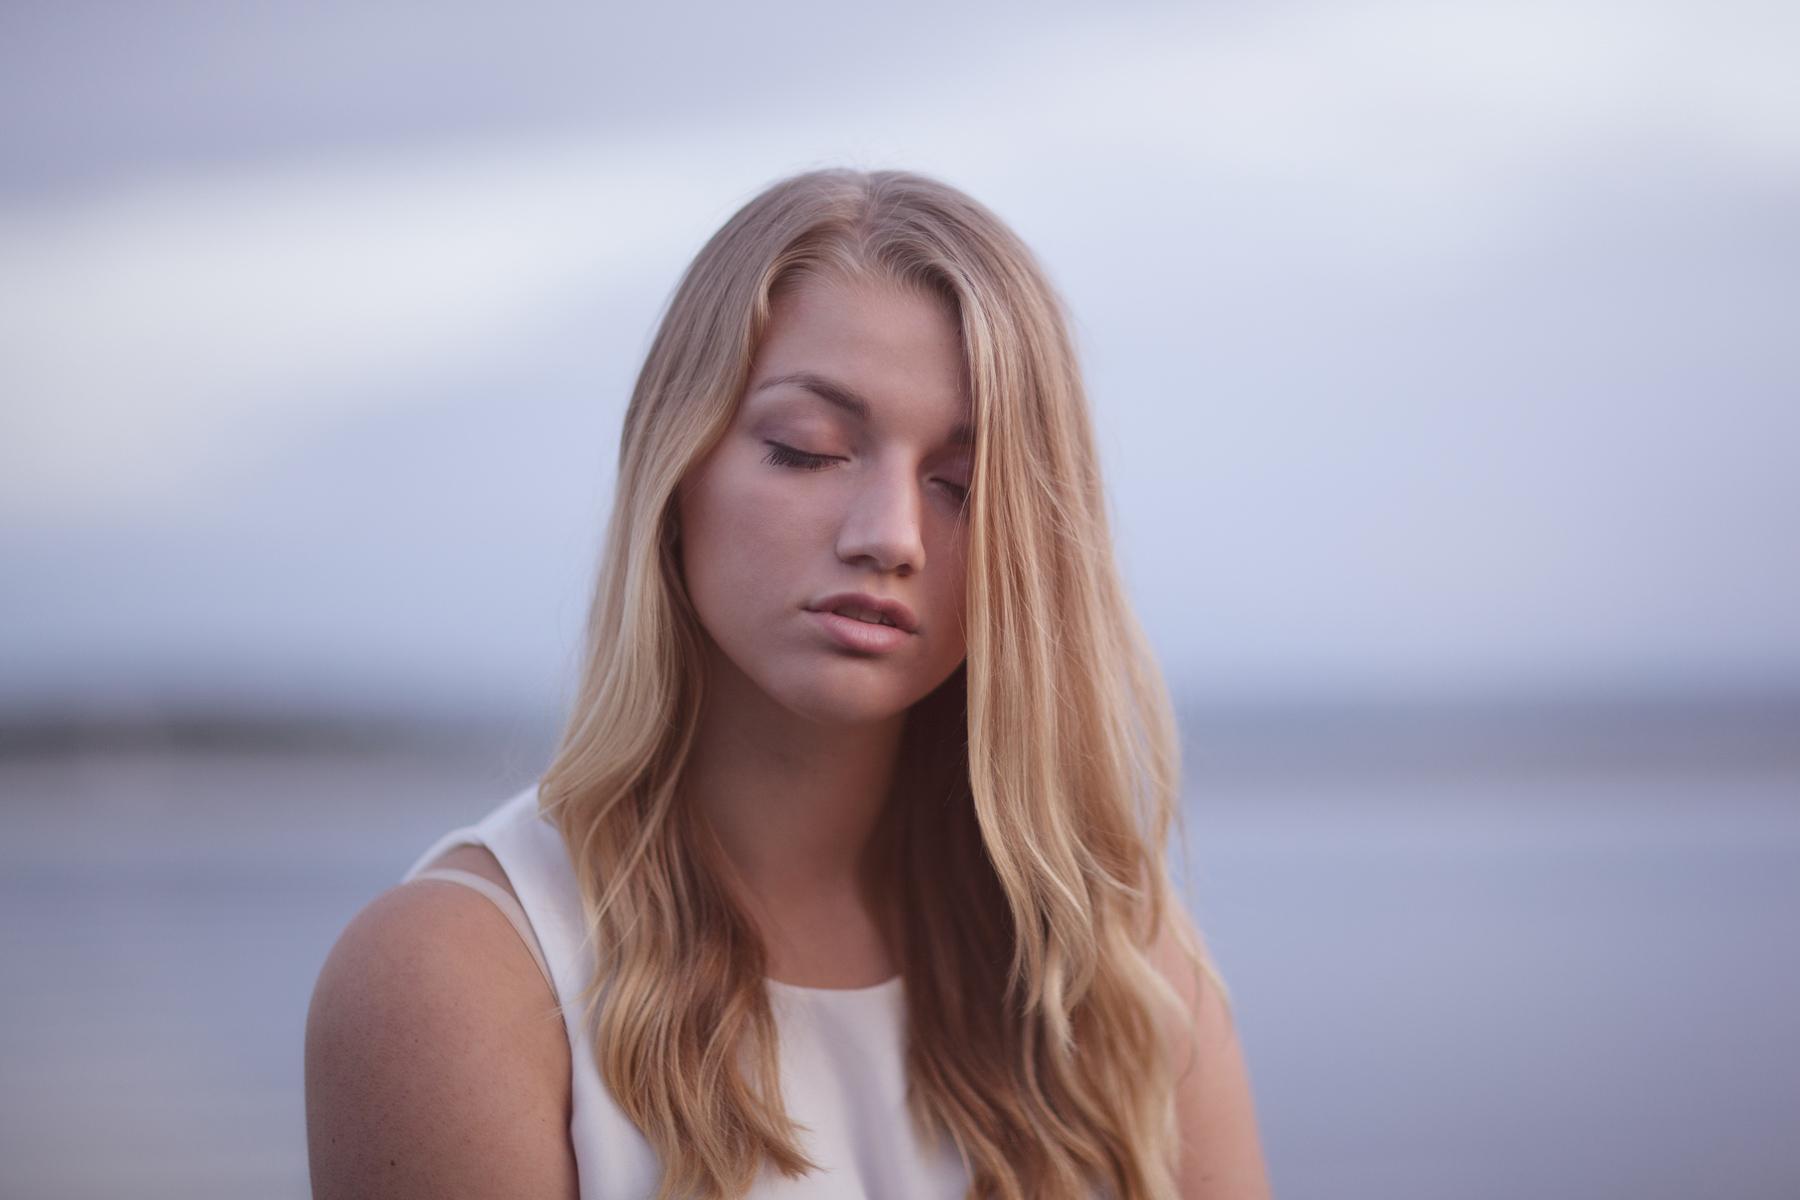 By Irina Nilsson Photography. www.irinanilsson.com